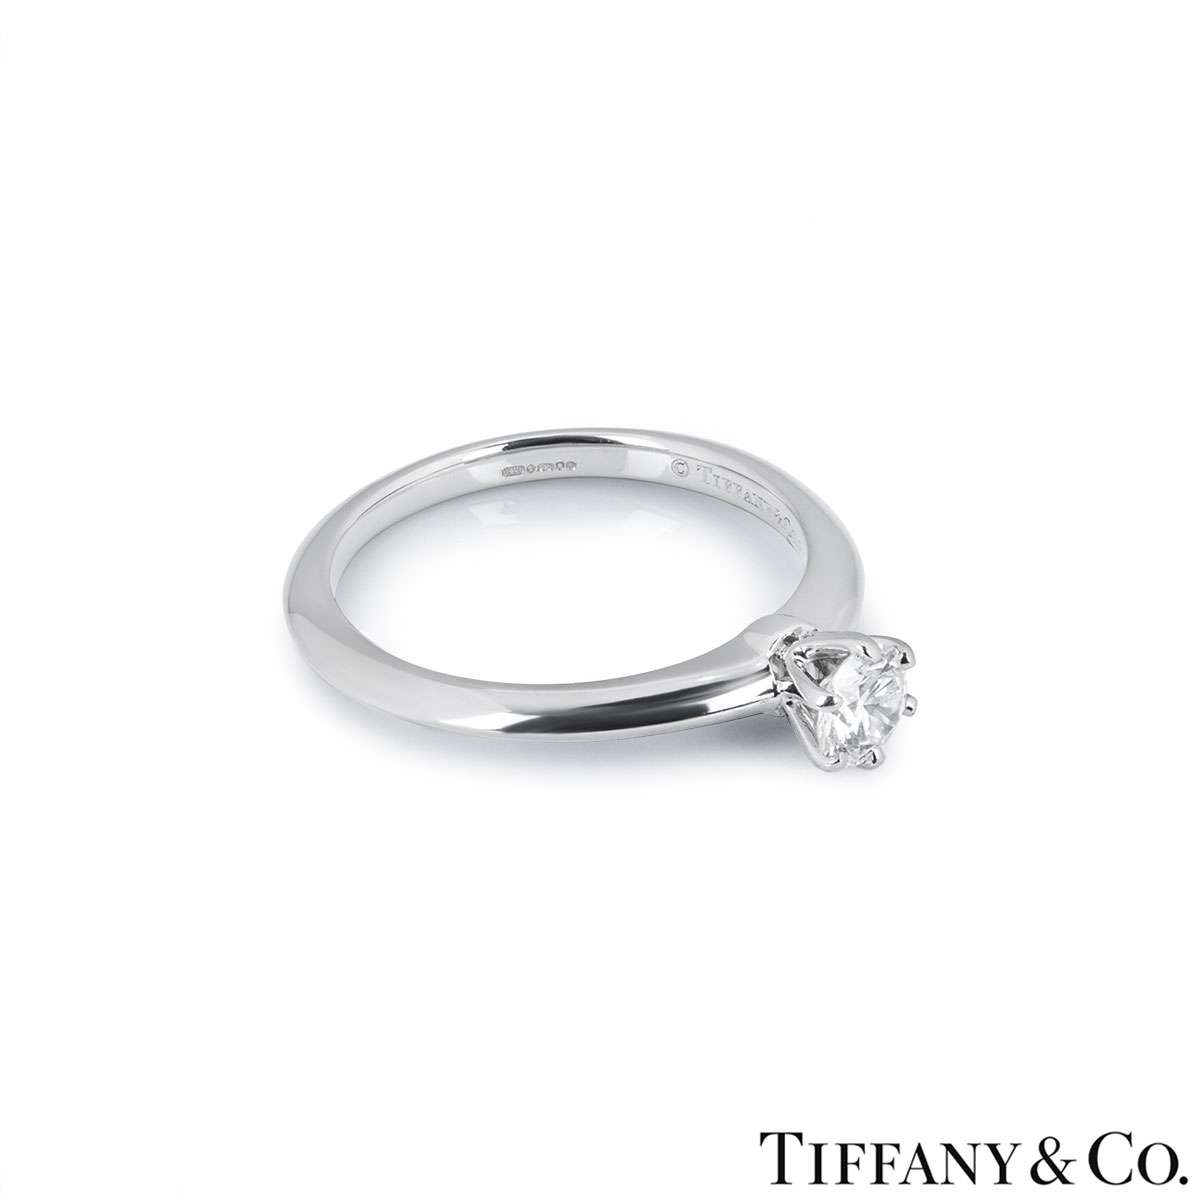 Tiffany & Co. Round Brilliant Cut Diamond Ring 0.32ct H/VVS1 XXX